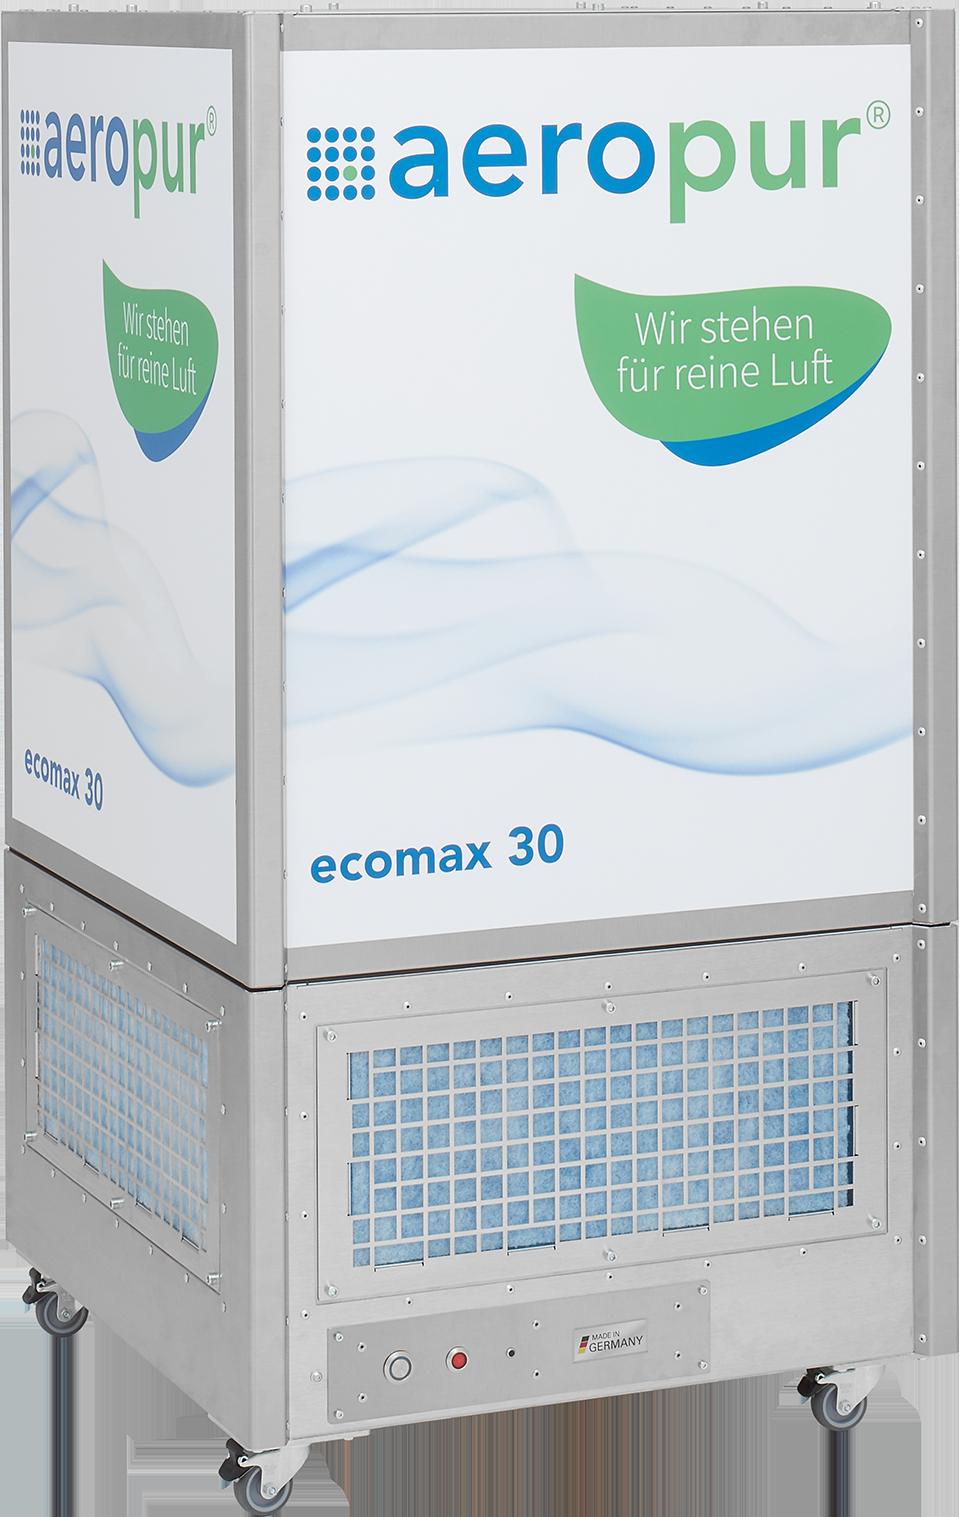 ecomax30